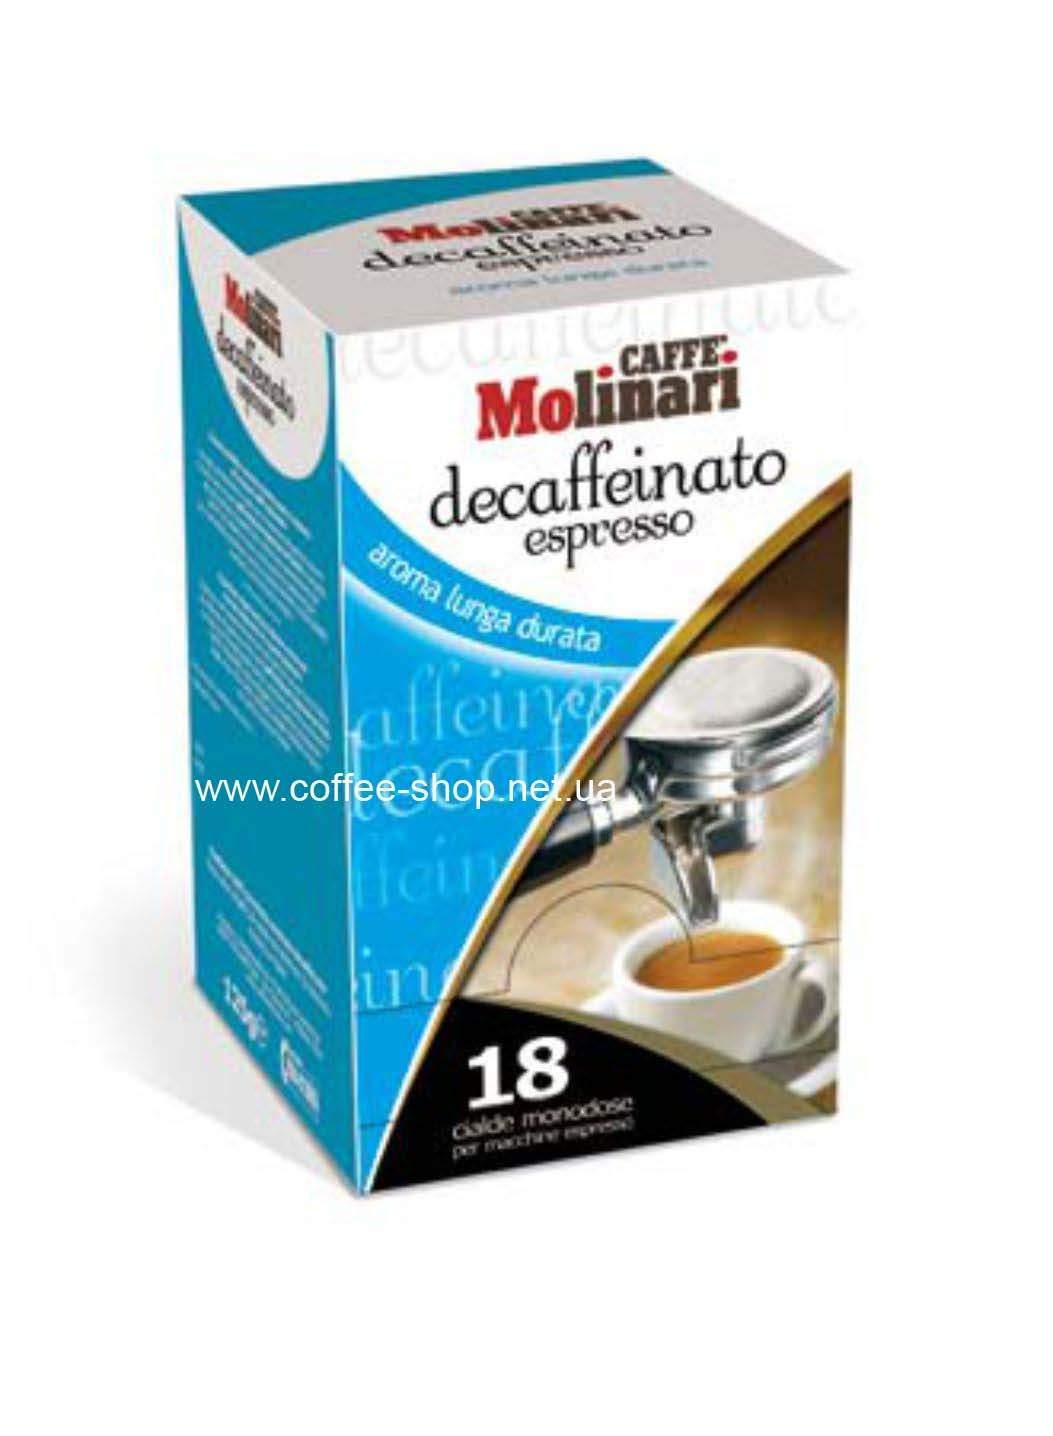 1960   Кофе в чалдах без кофеина Molinari Espresso 18 шт.   Coffee Shop